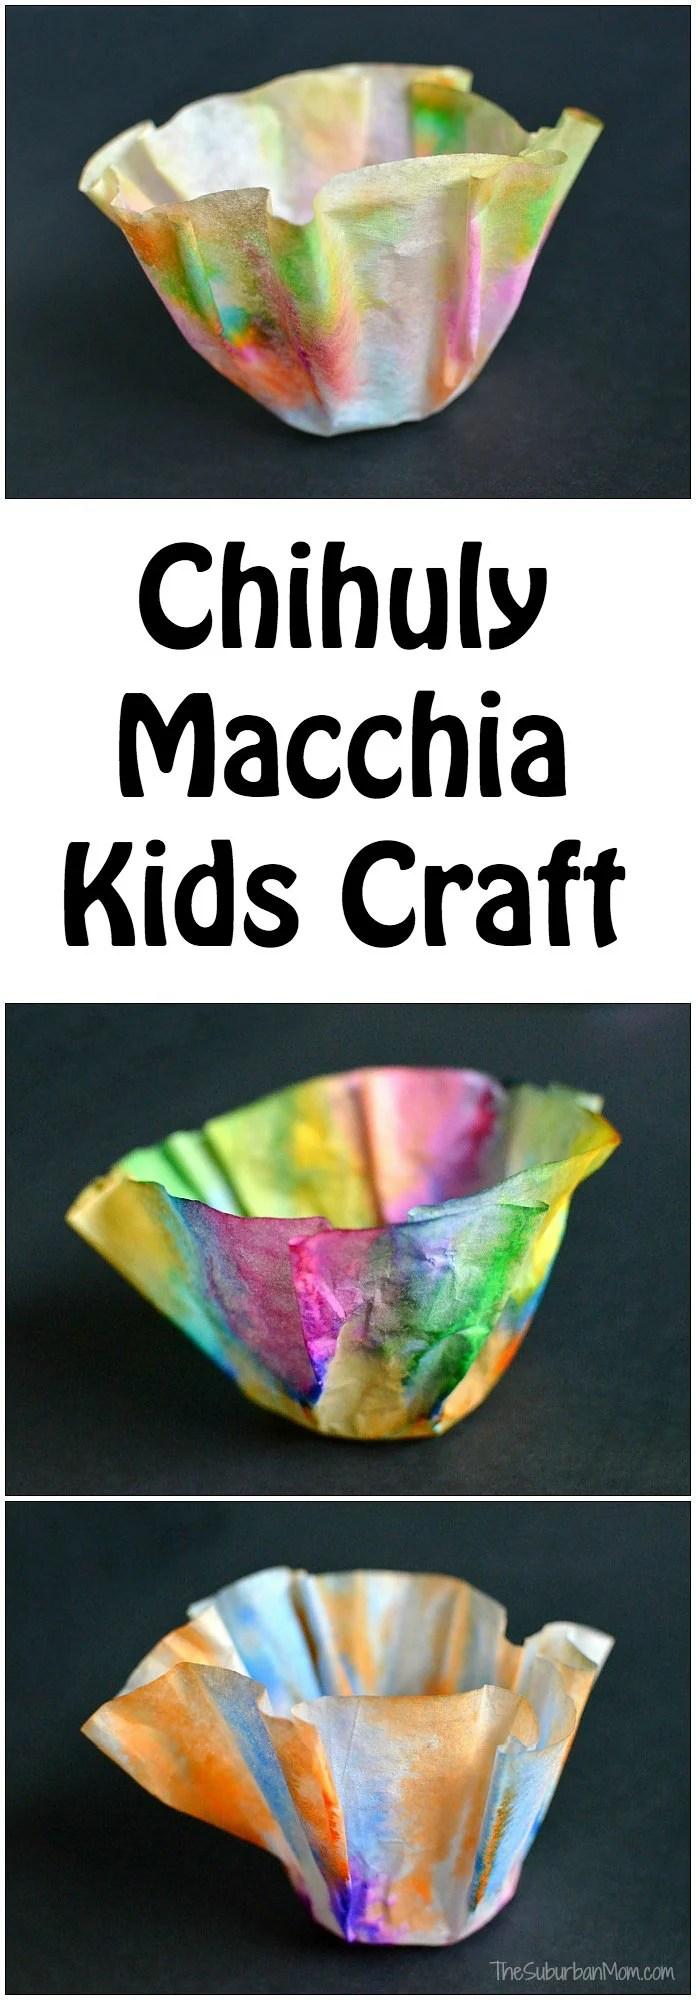 Chihuly Macchia Kids Craft